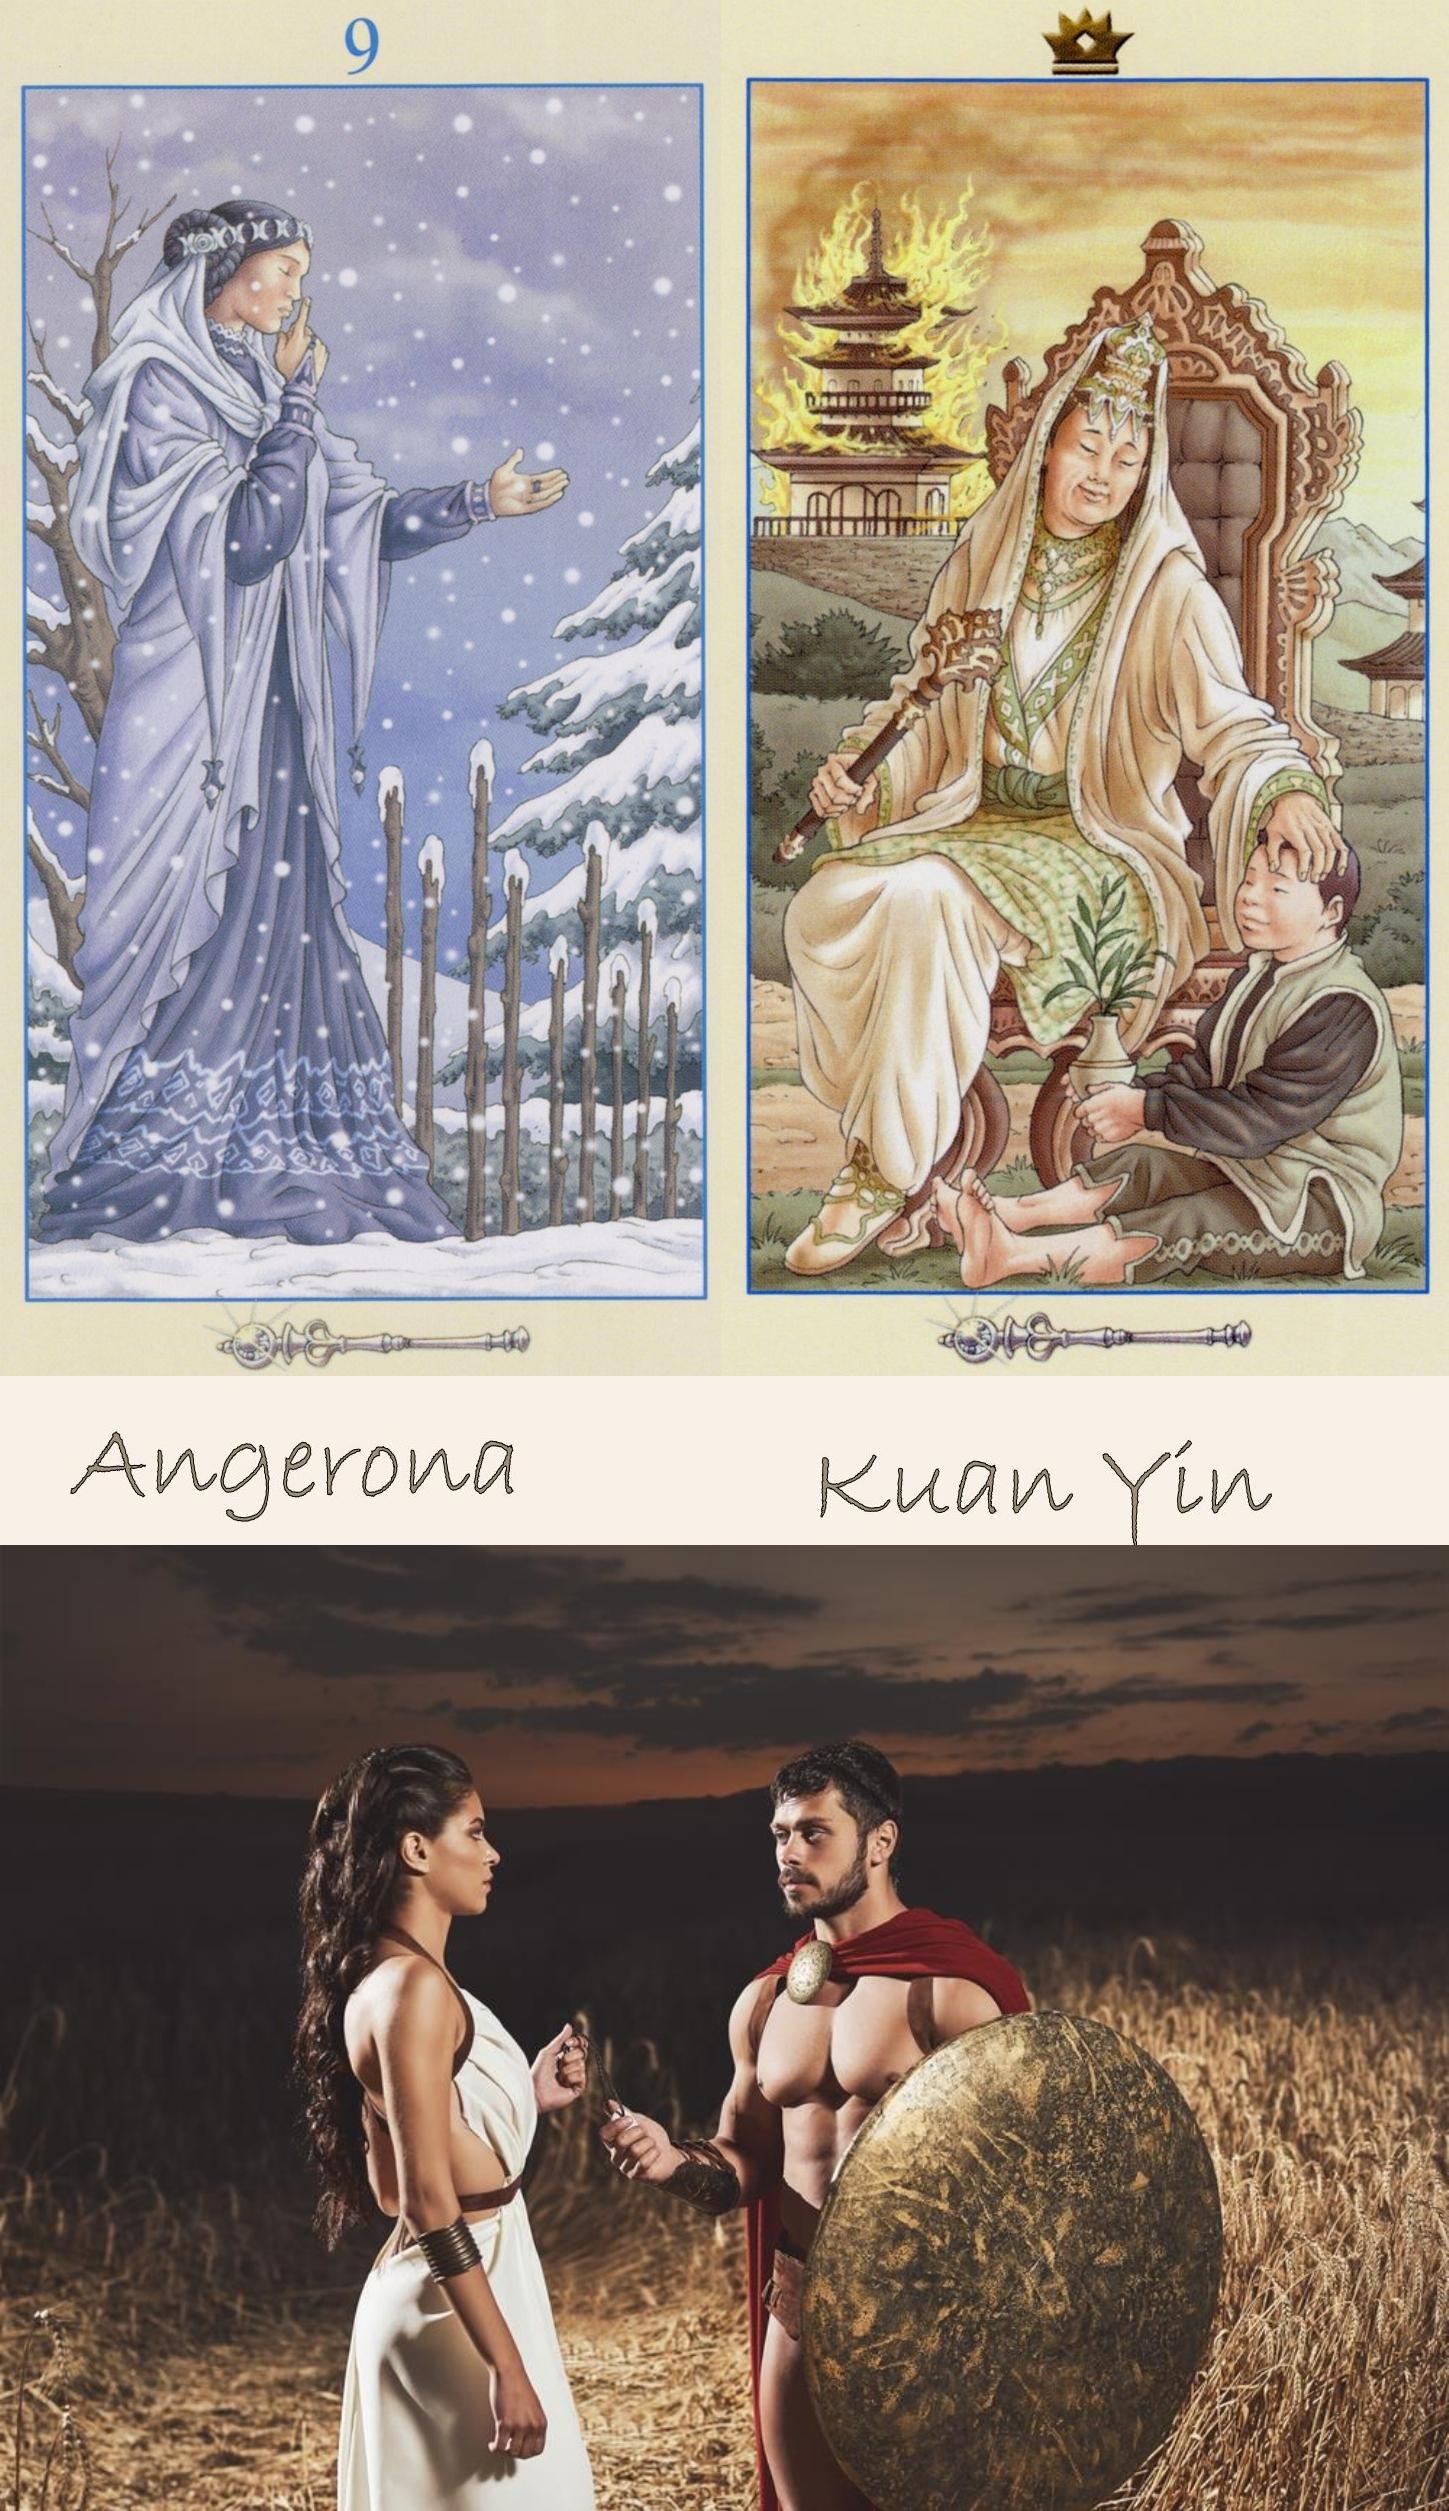 tarot guidebook, tarot card reading in hindi 2016 and divination ...